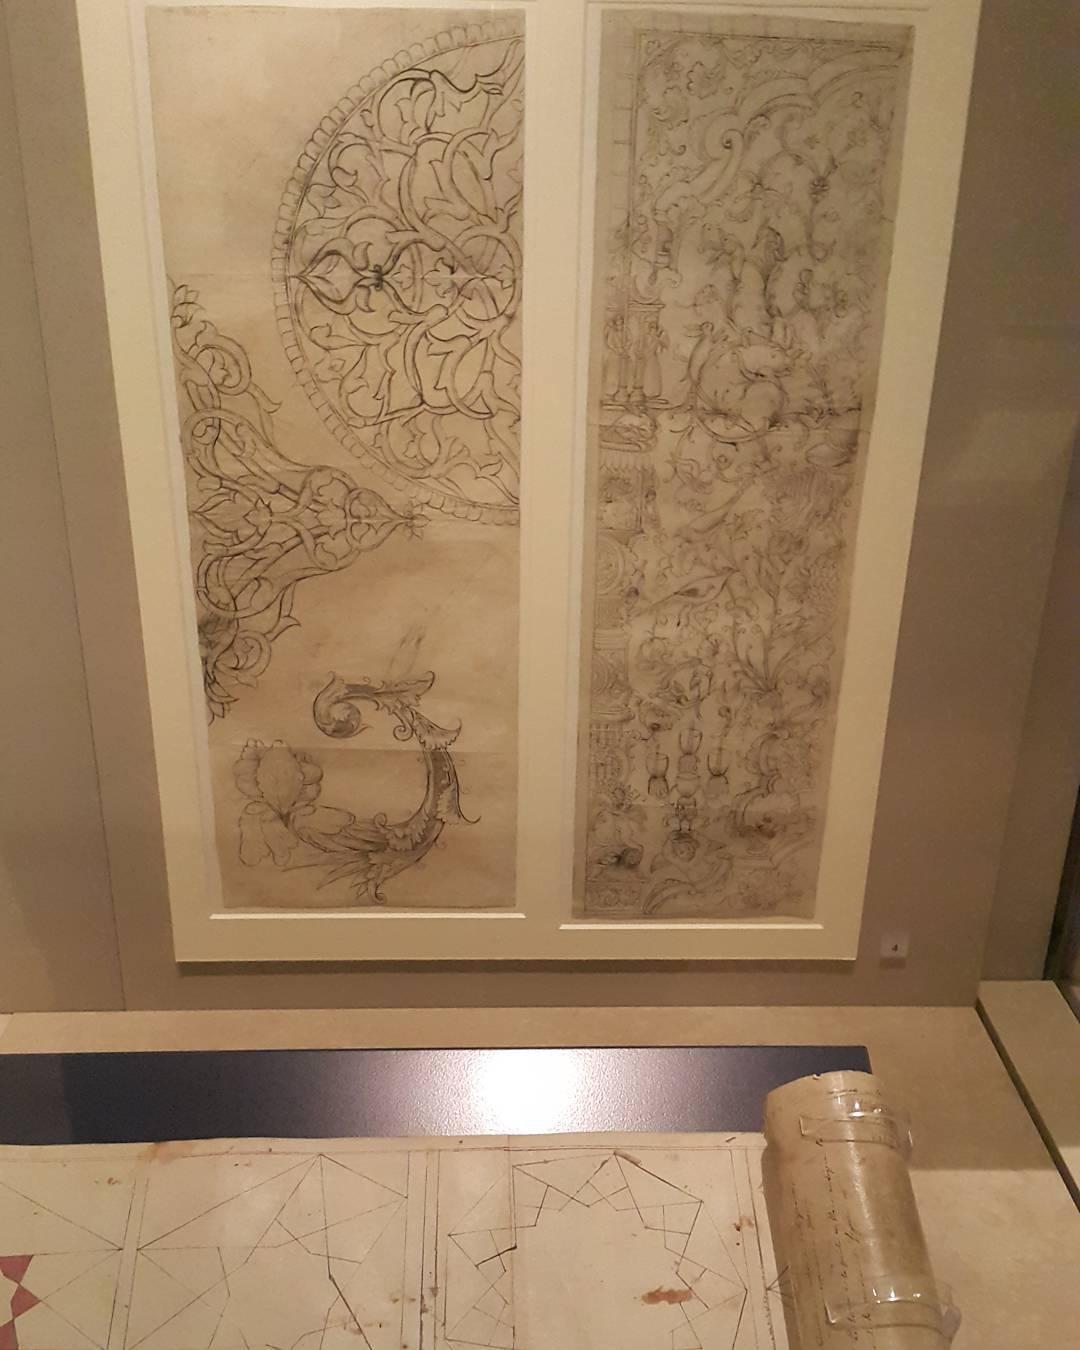 Khat Diwani Ajhalawani/Amr #زخرفة_اسلامية من إيران.  #متحف_فيكتوريا_أند_ألبرت  #لندن  #بريطانيا… 38